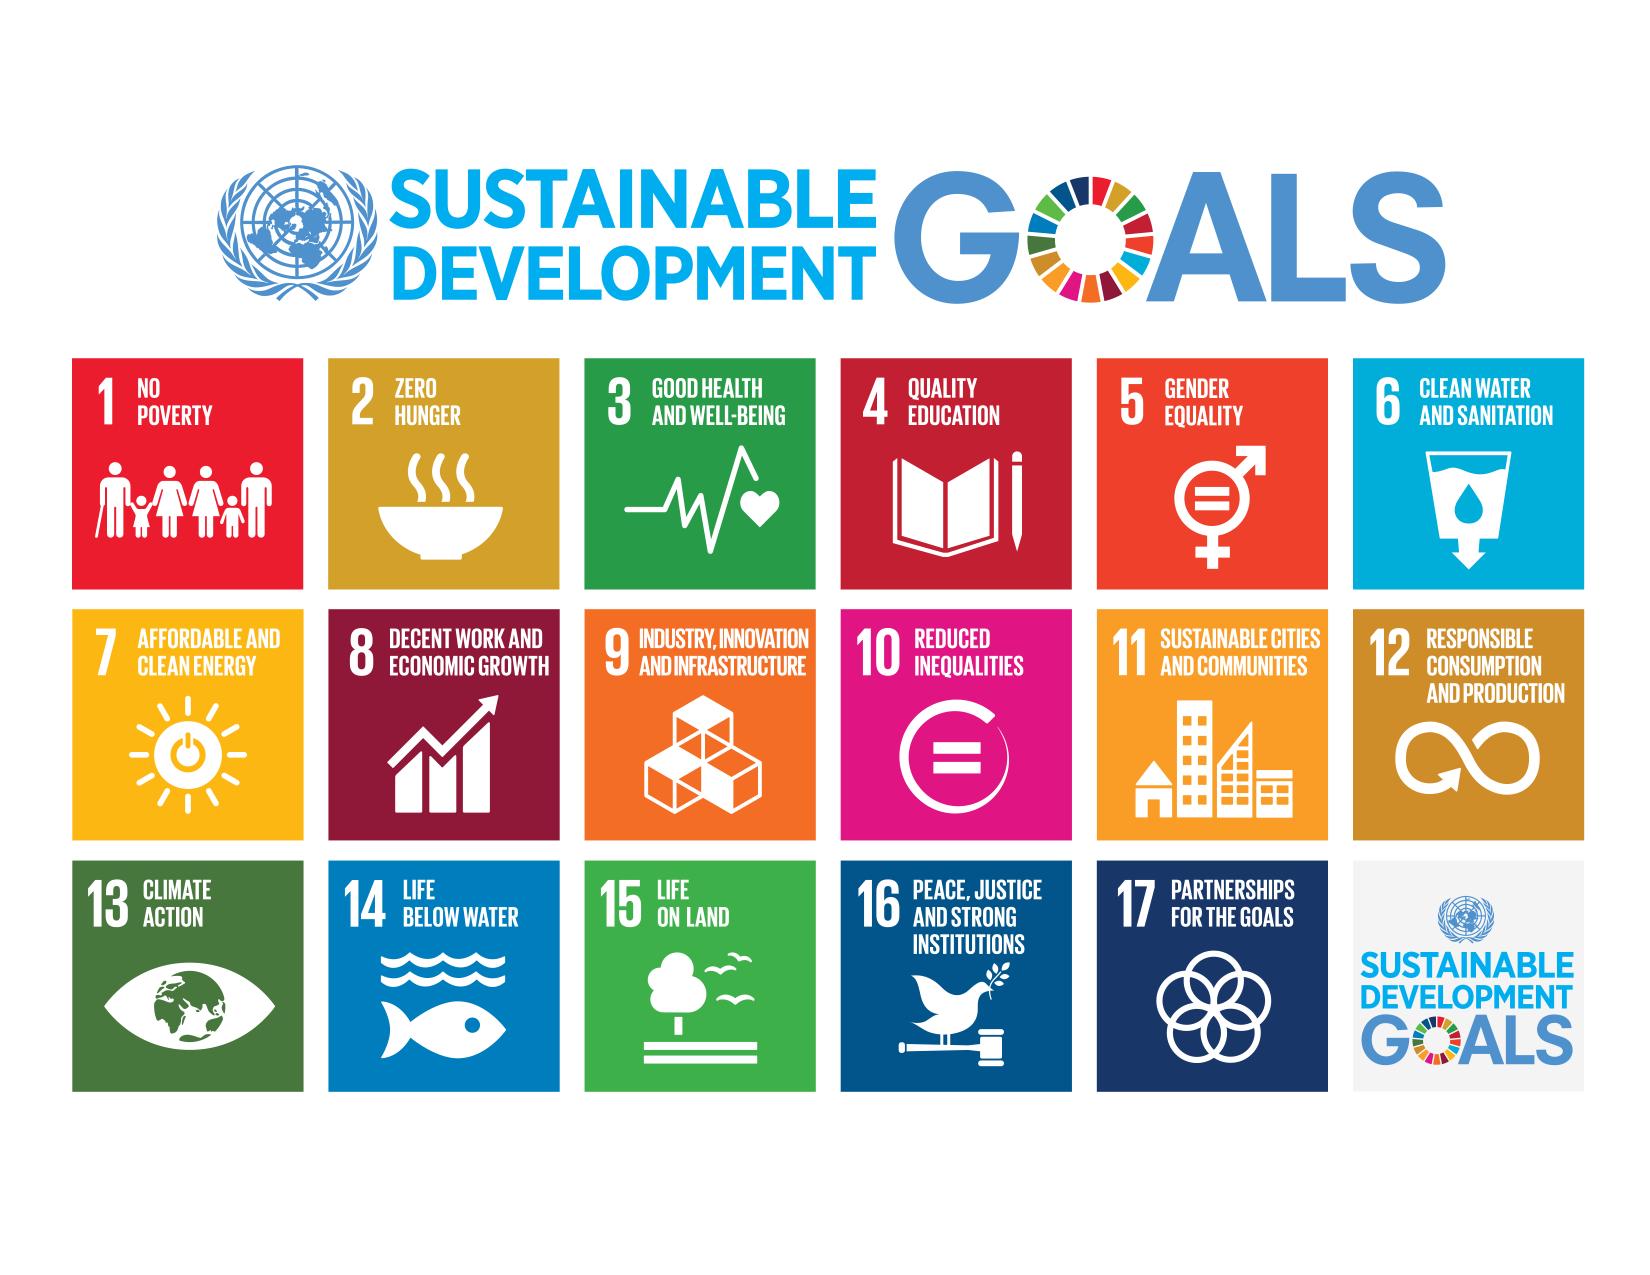 Image Credit: http://www.un.org/sustainabledevelopment/